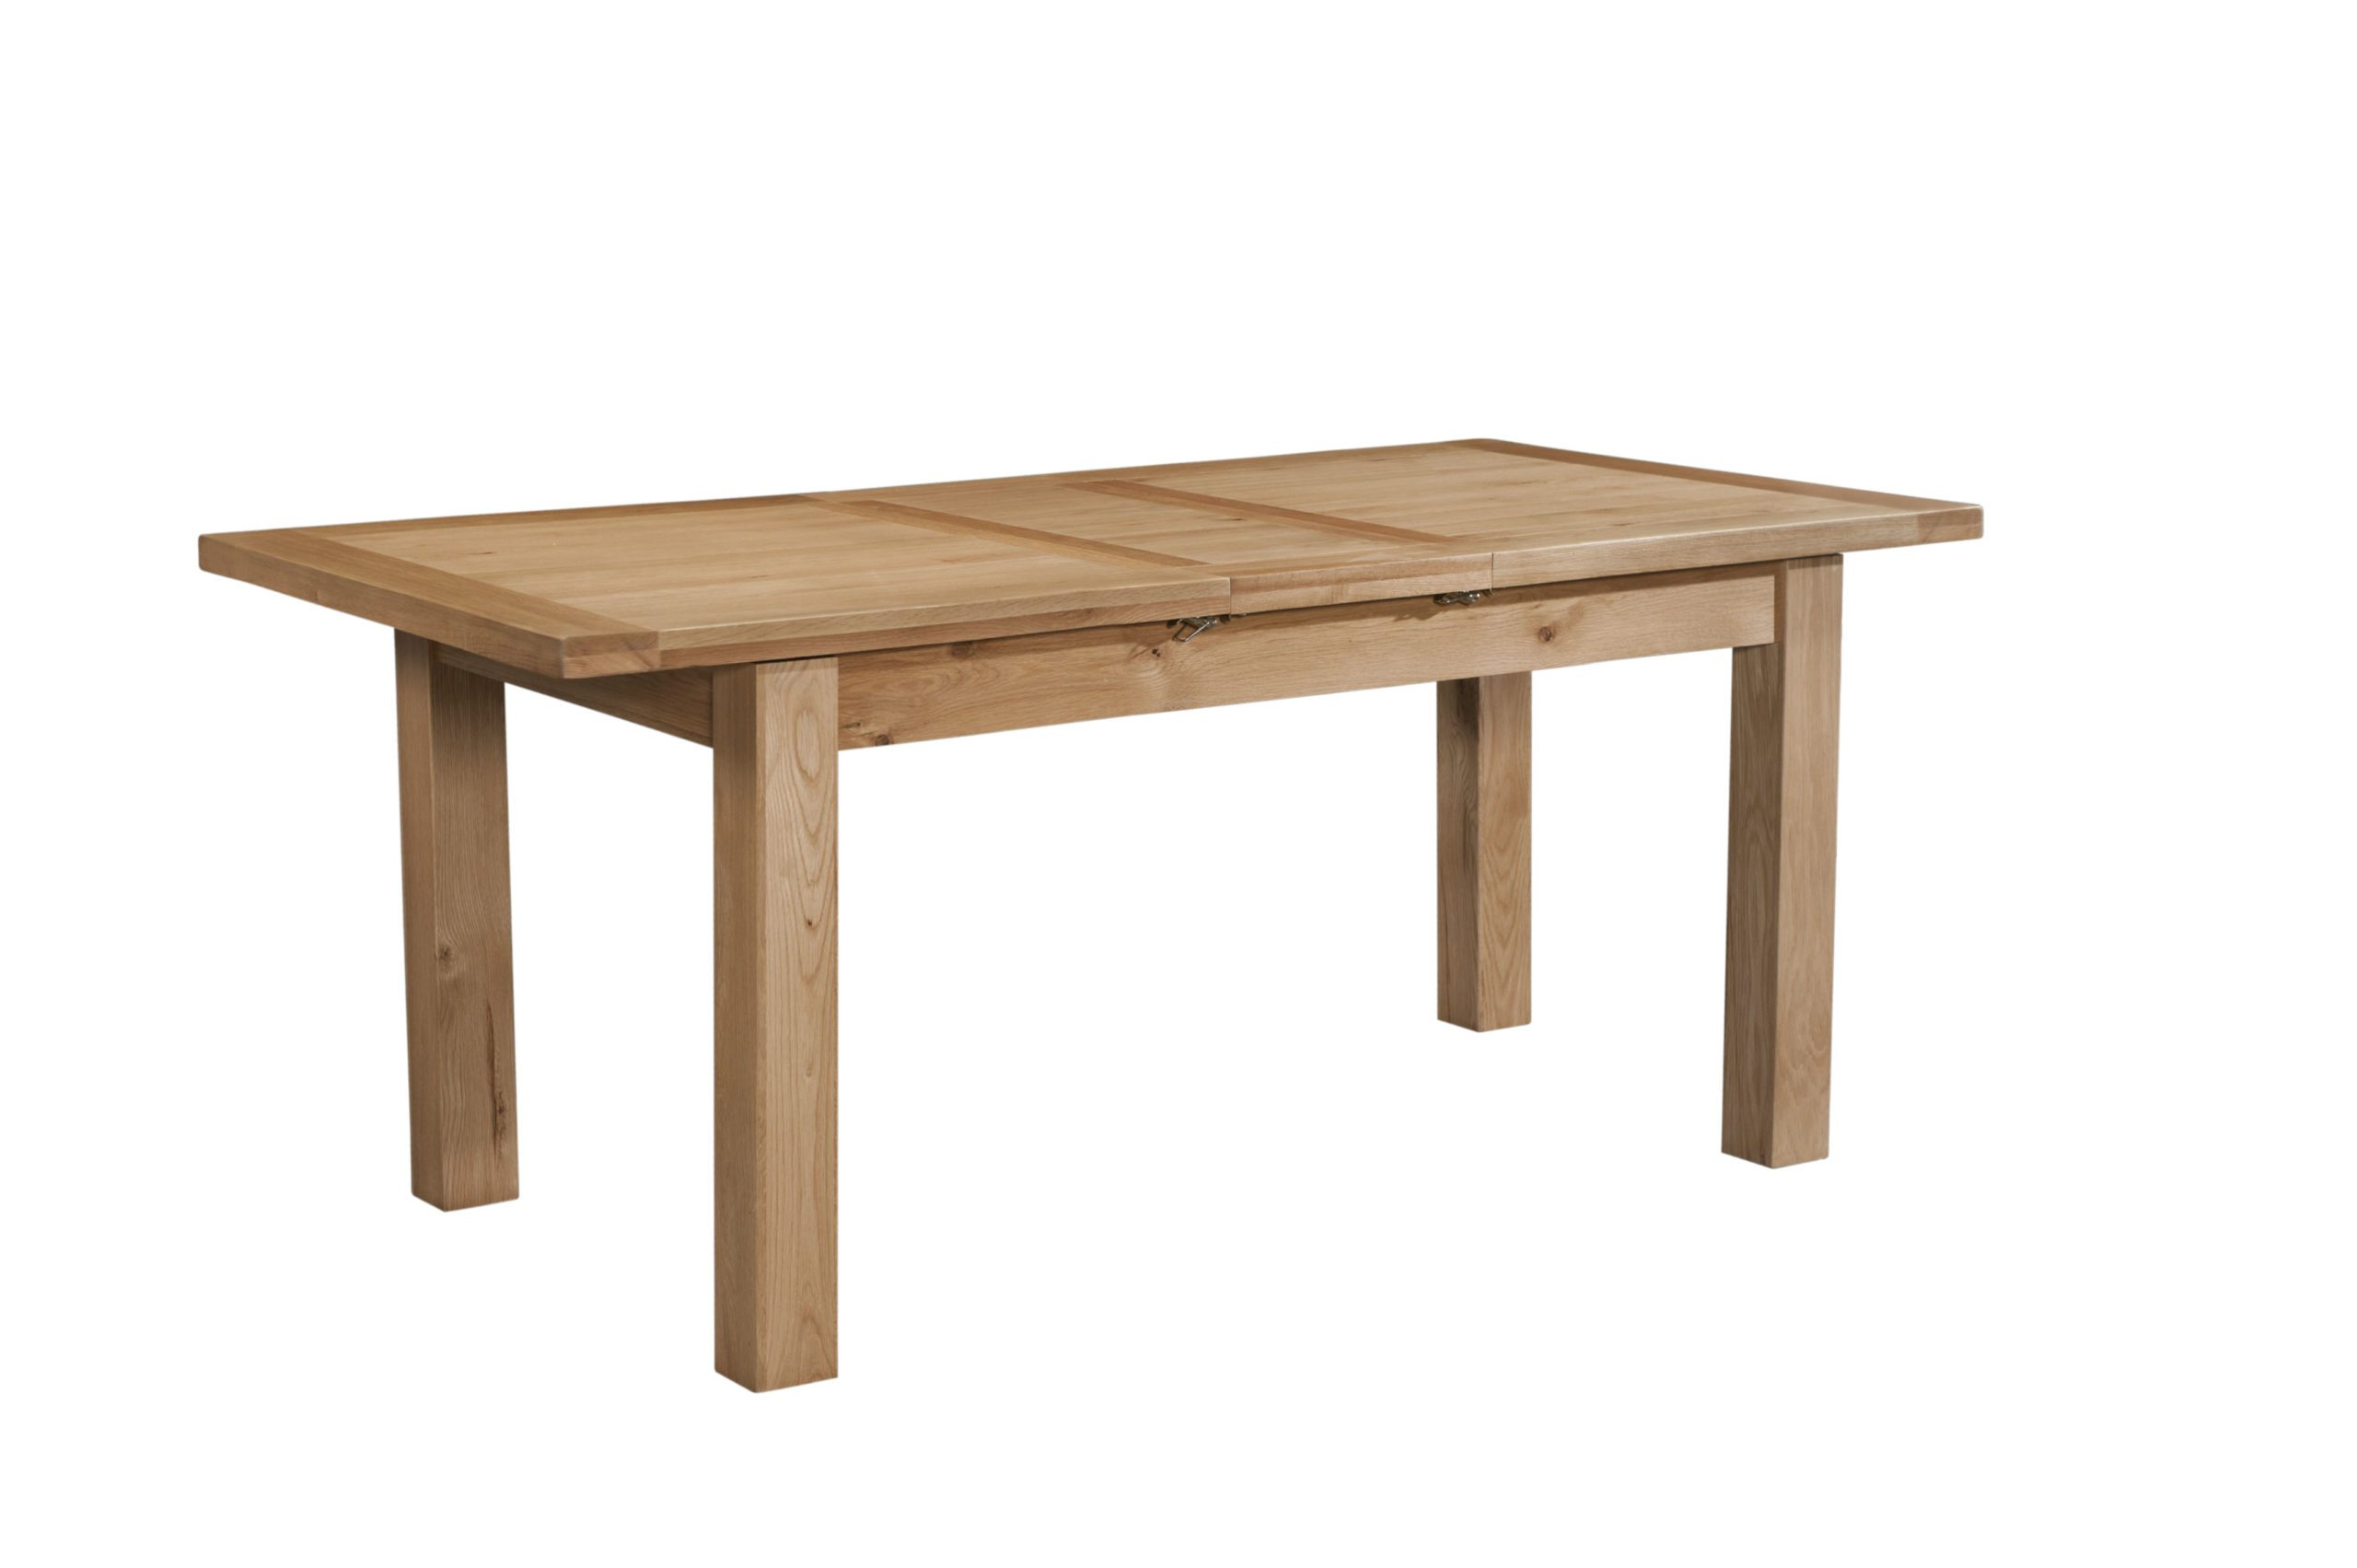 Dorset oak dining table 120cm light oak with 1 extension